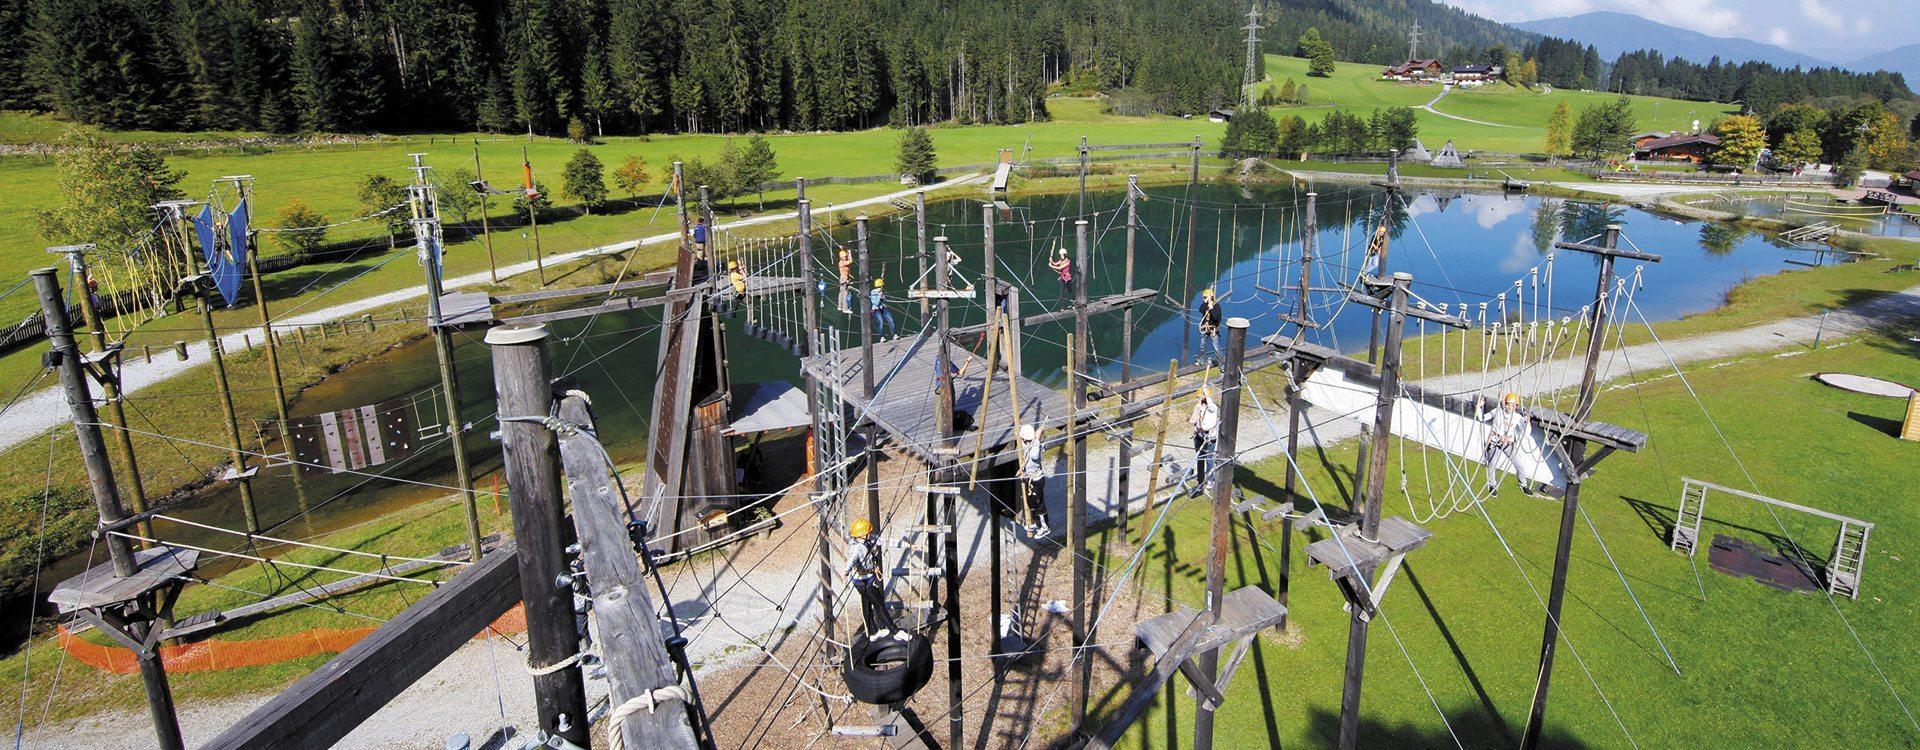 Aktivprogramm im Jugendhotel Saringgut, Salzburg